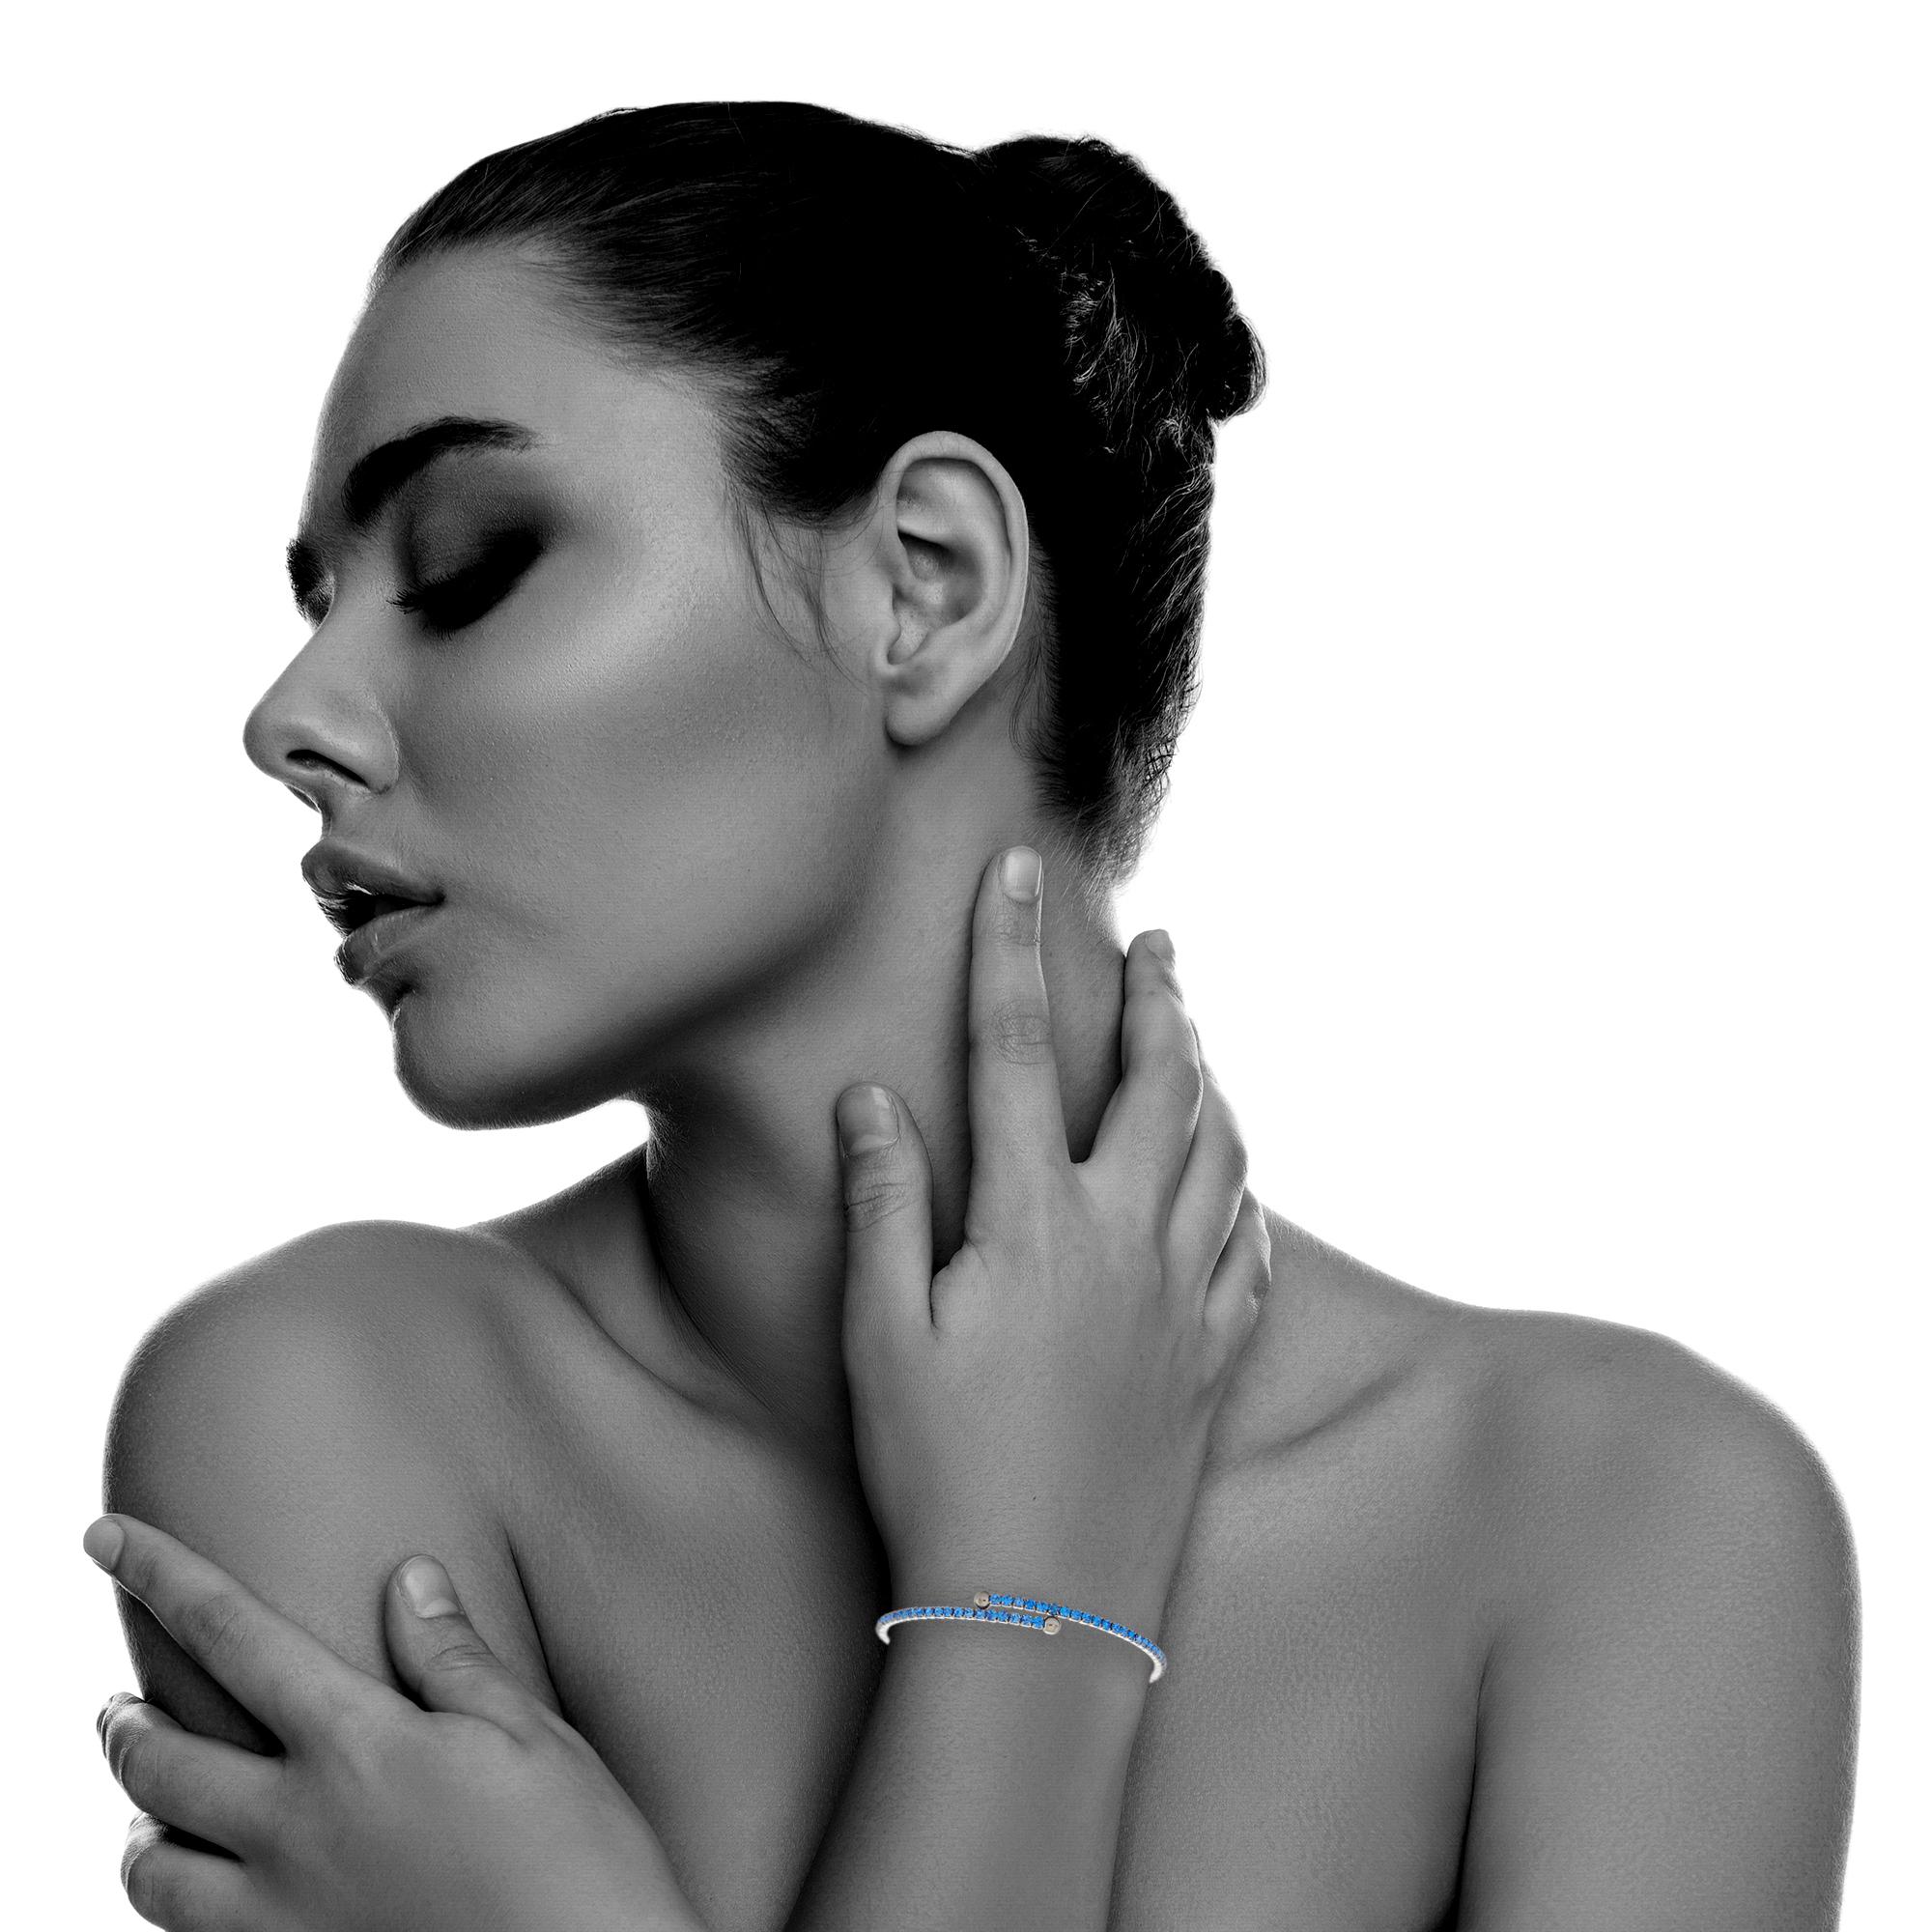 Womens-Ladies-Fashion-Accessories-Jewelry-Black-Rhodium-Plated-Bangle-Bracelet thumbnail 35